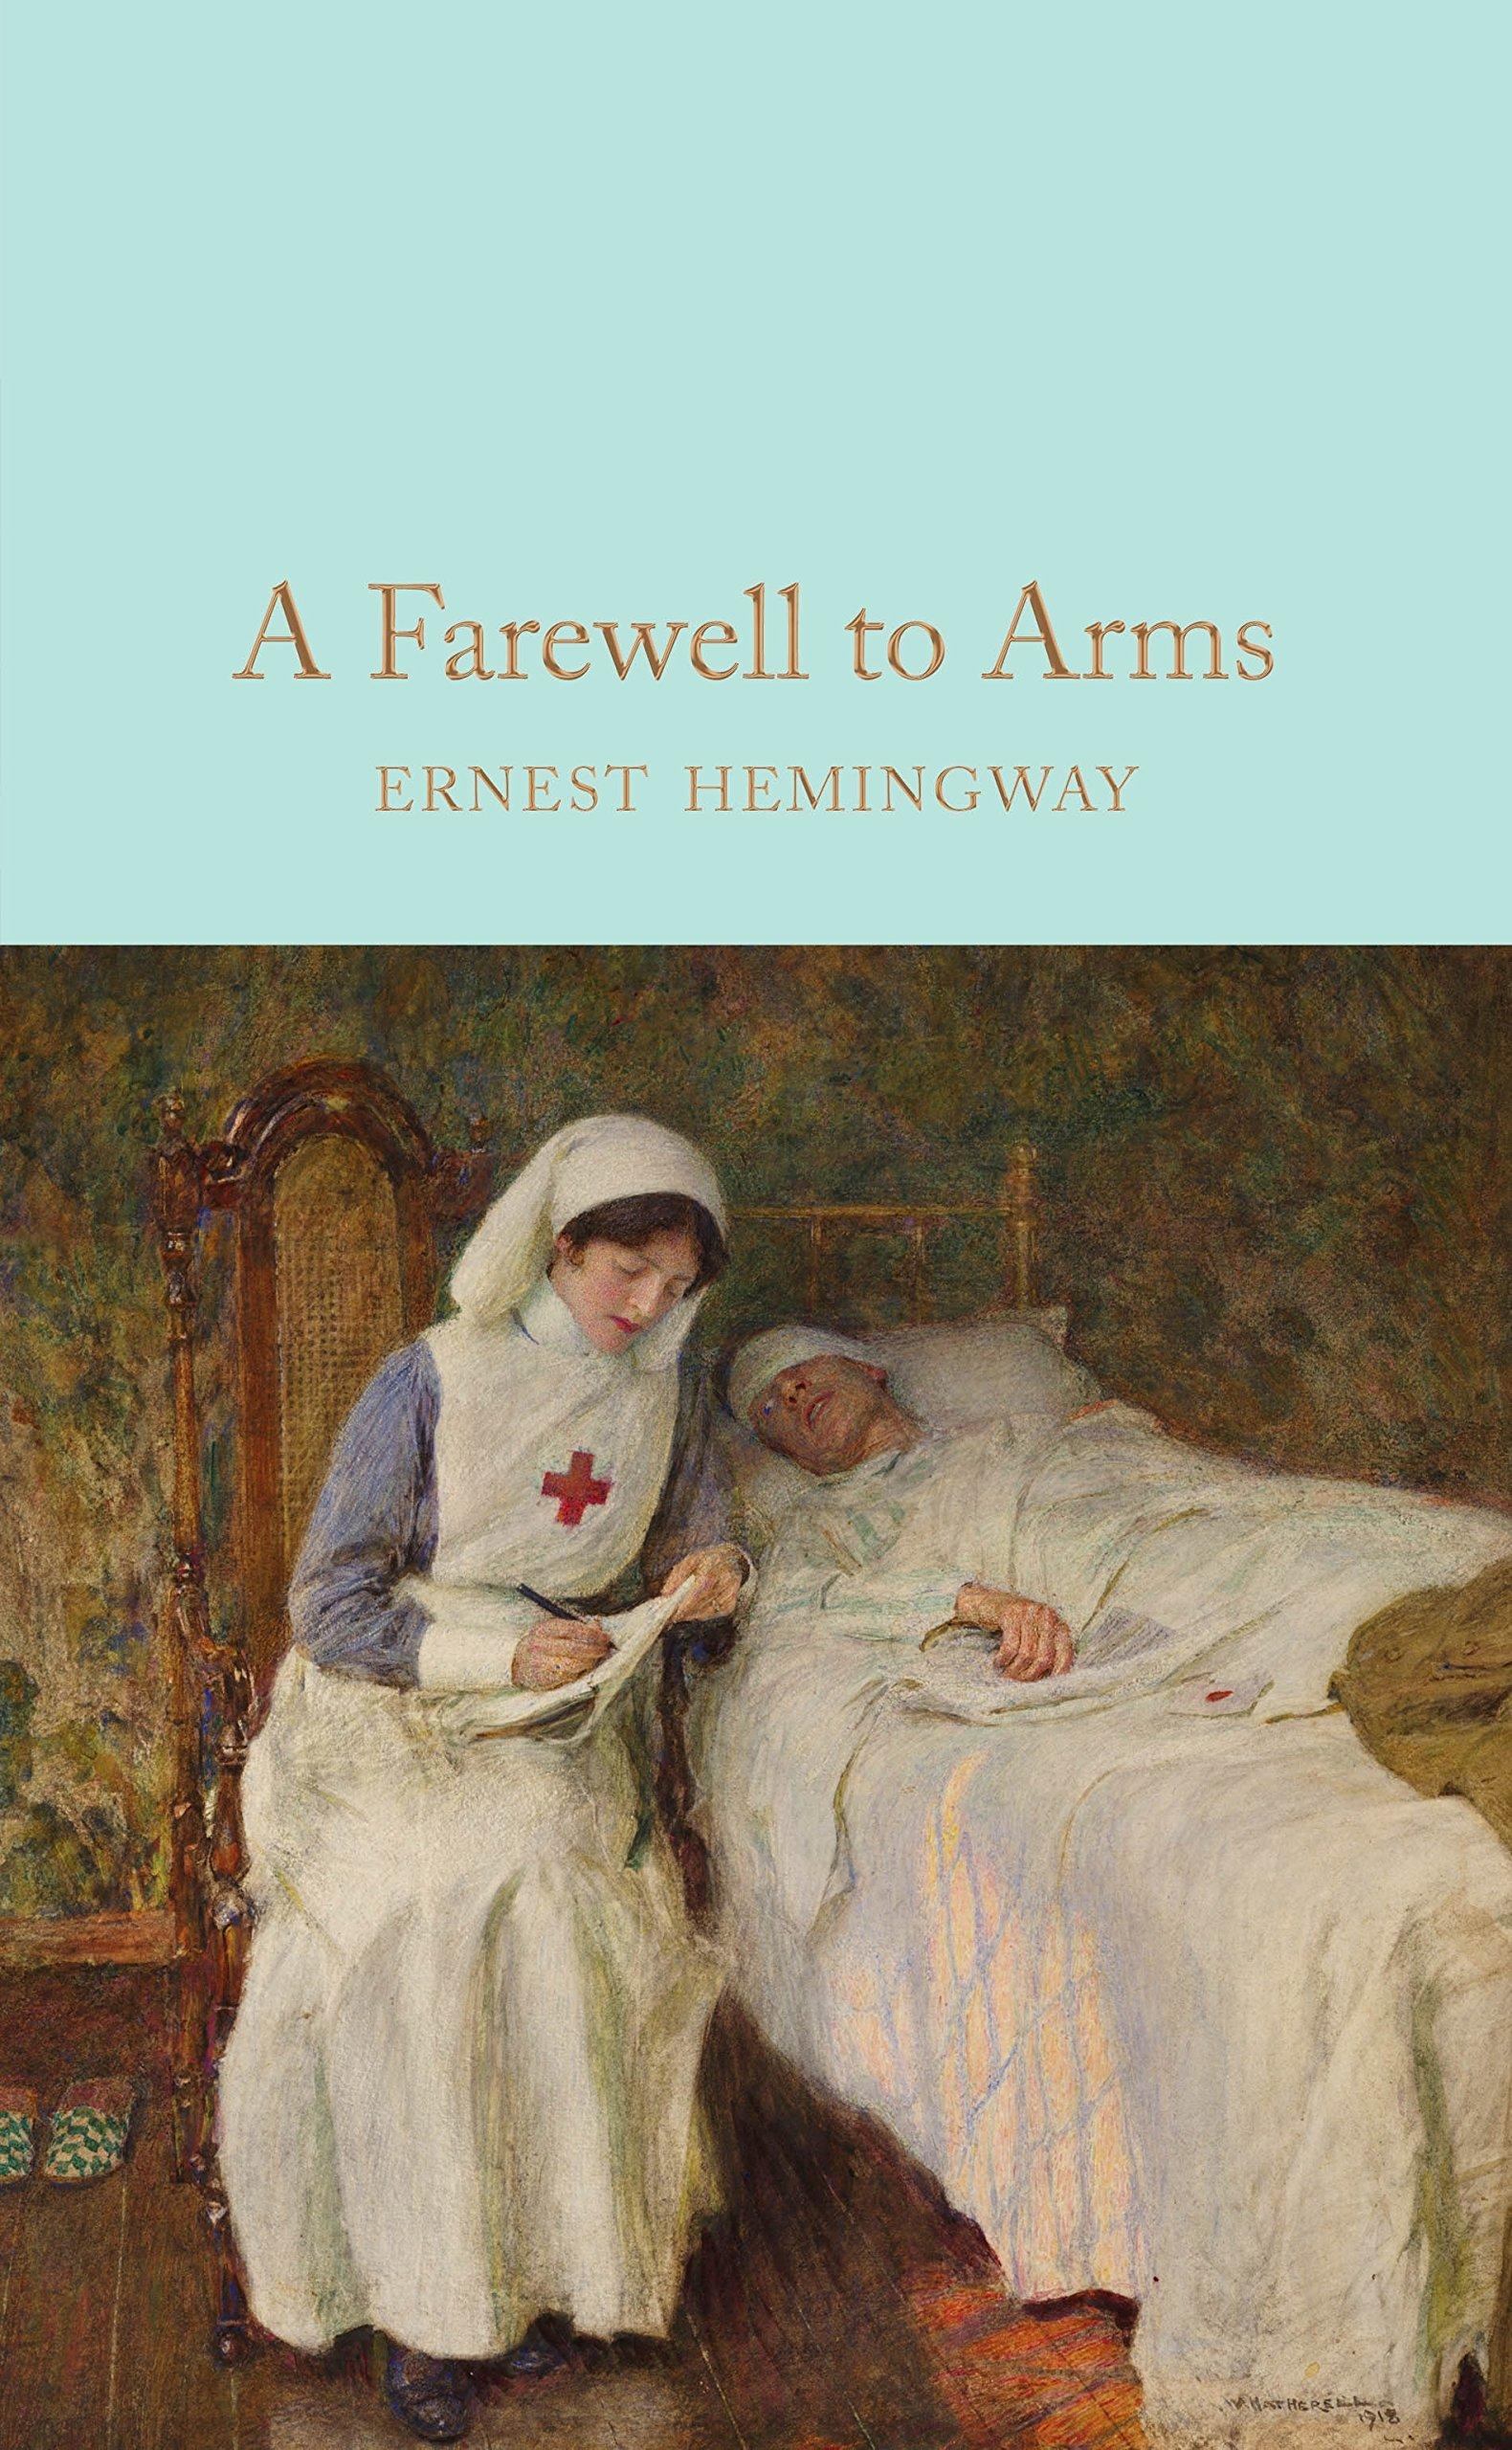 A Farewell To Arms (Macmillan Collectors Library): Amazon.es: Ernest Hemingway: Libros en idiomas extranjeros